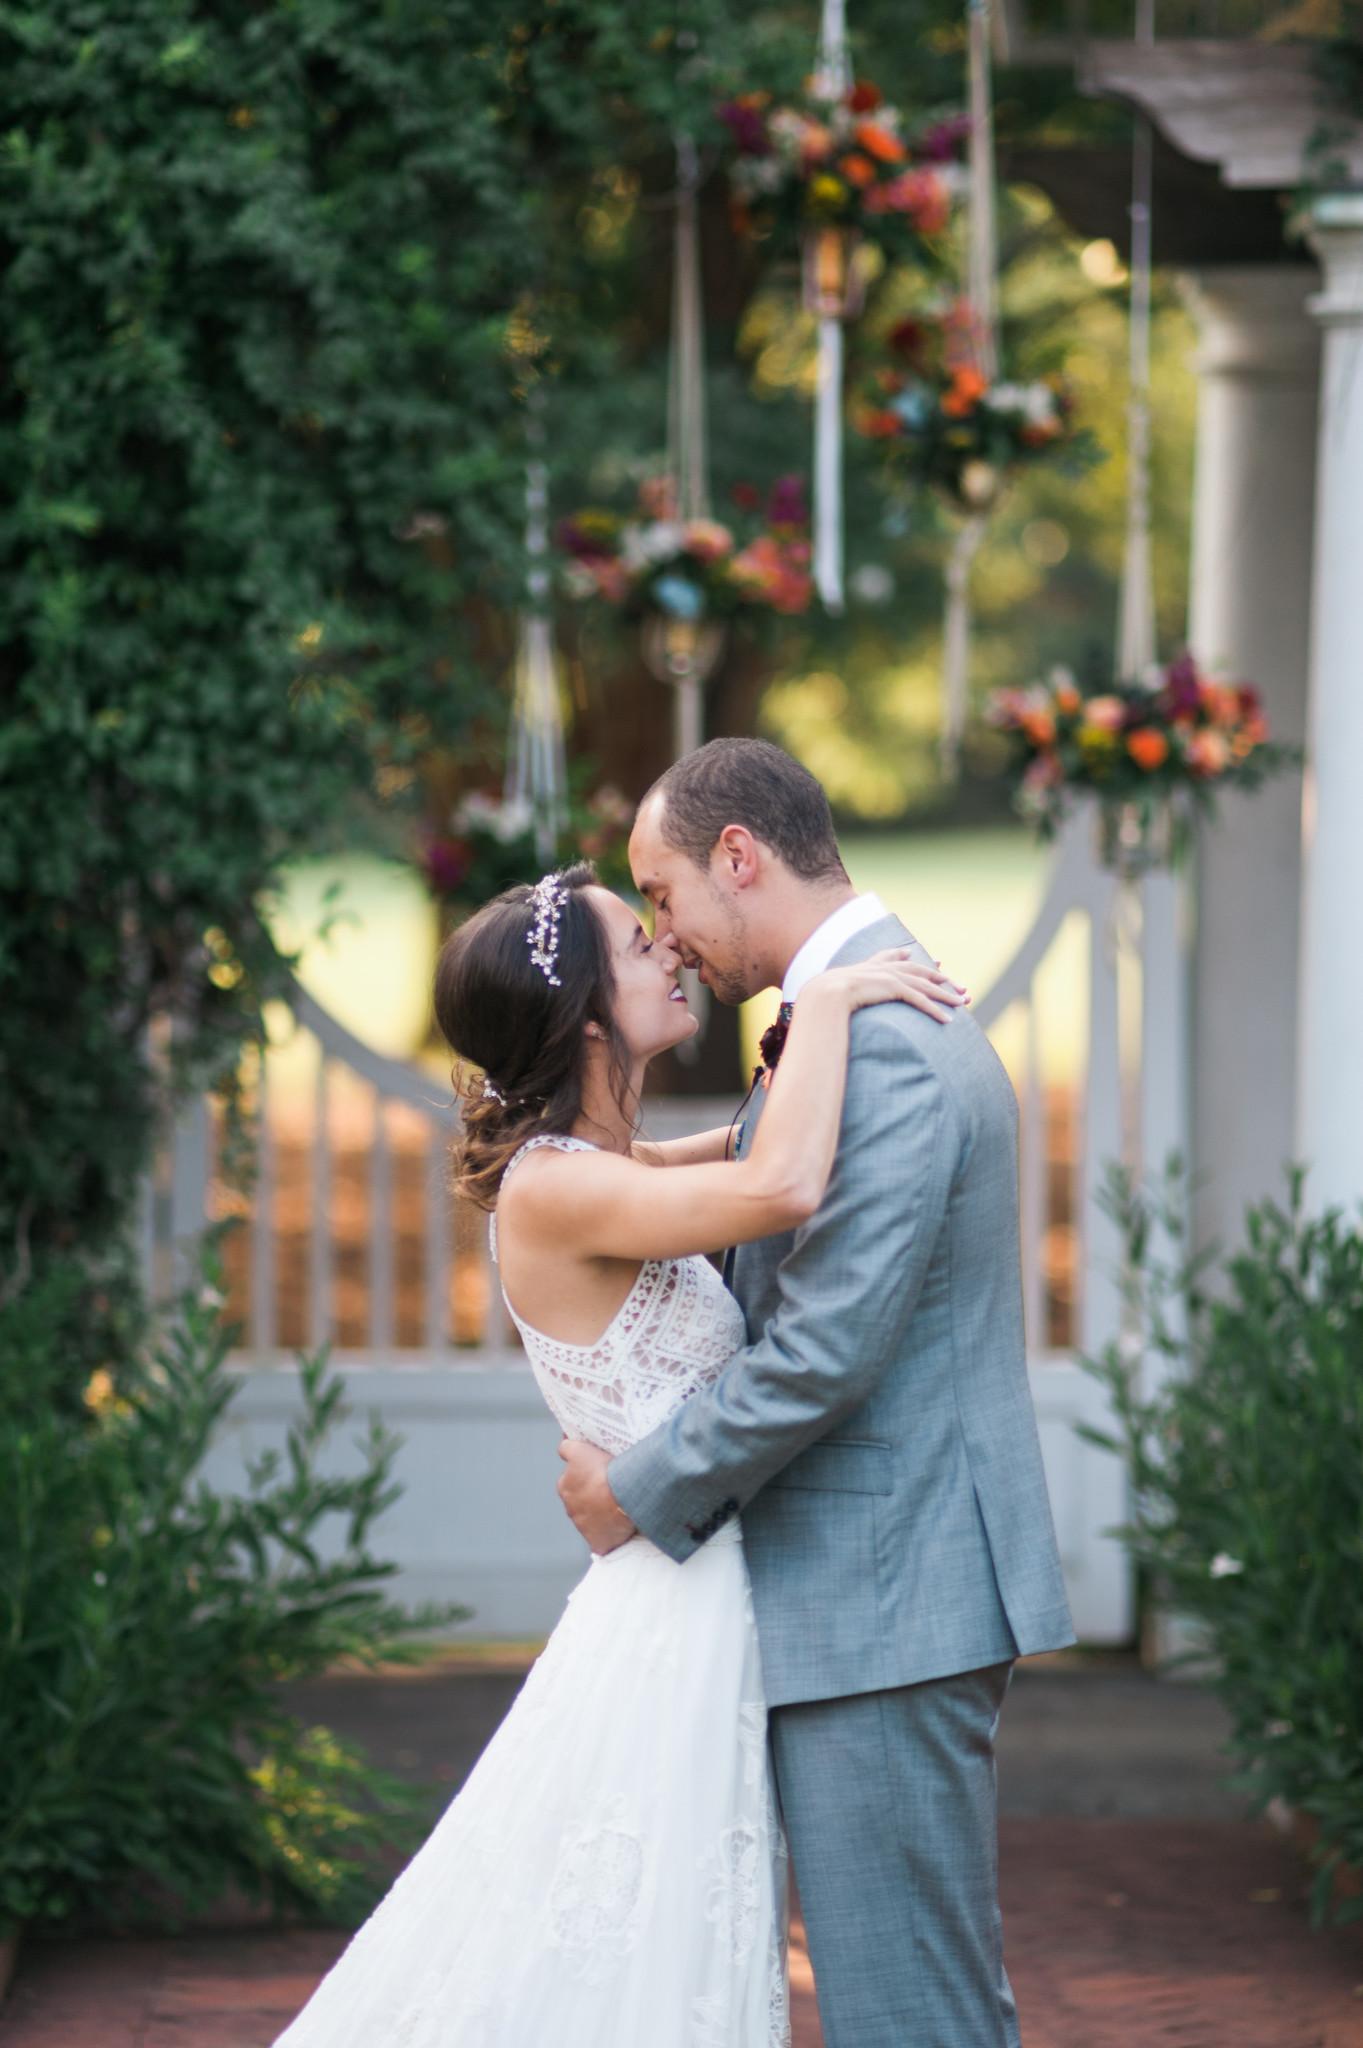 thomas-wedding-236-X4.jpg